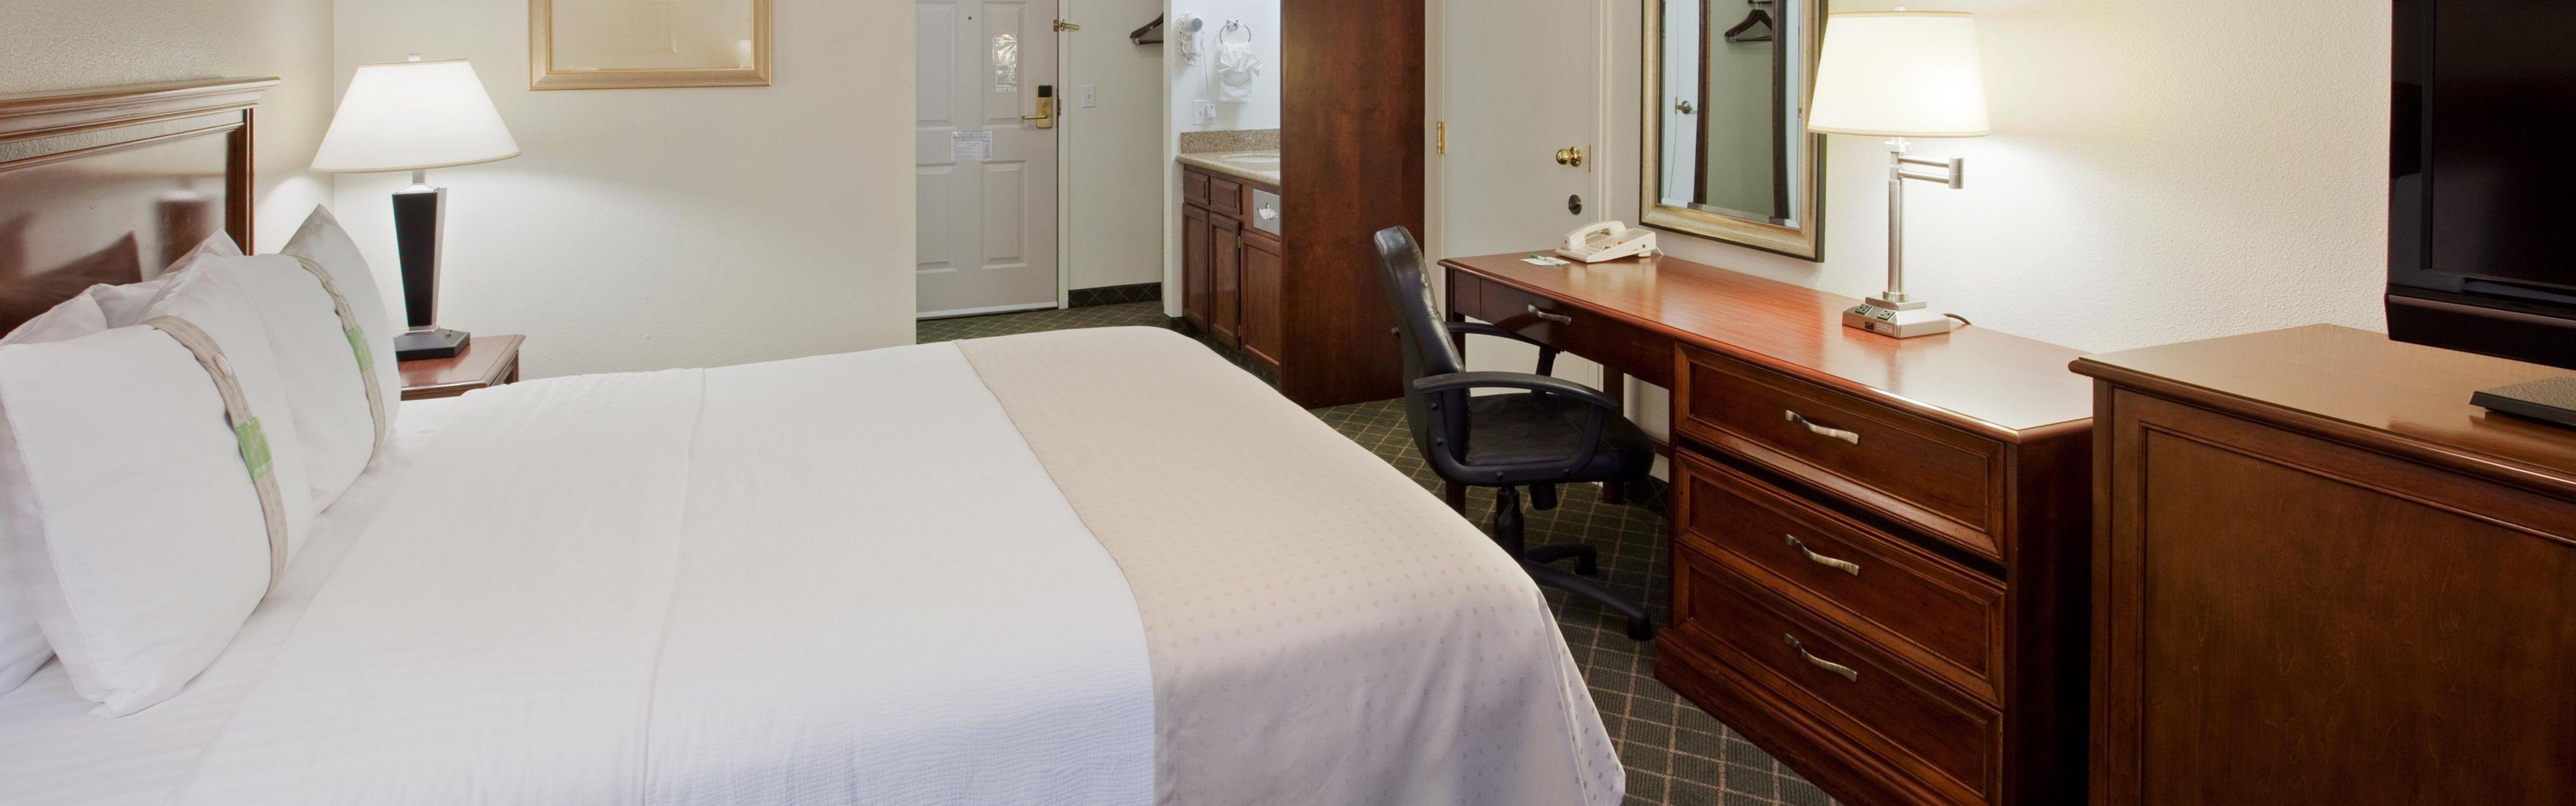 Holiday Inn Redding image 1